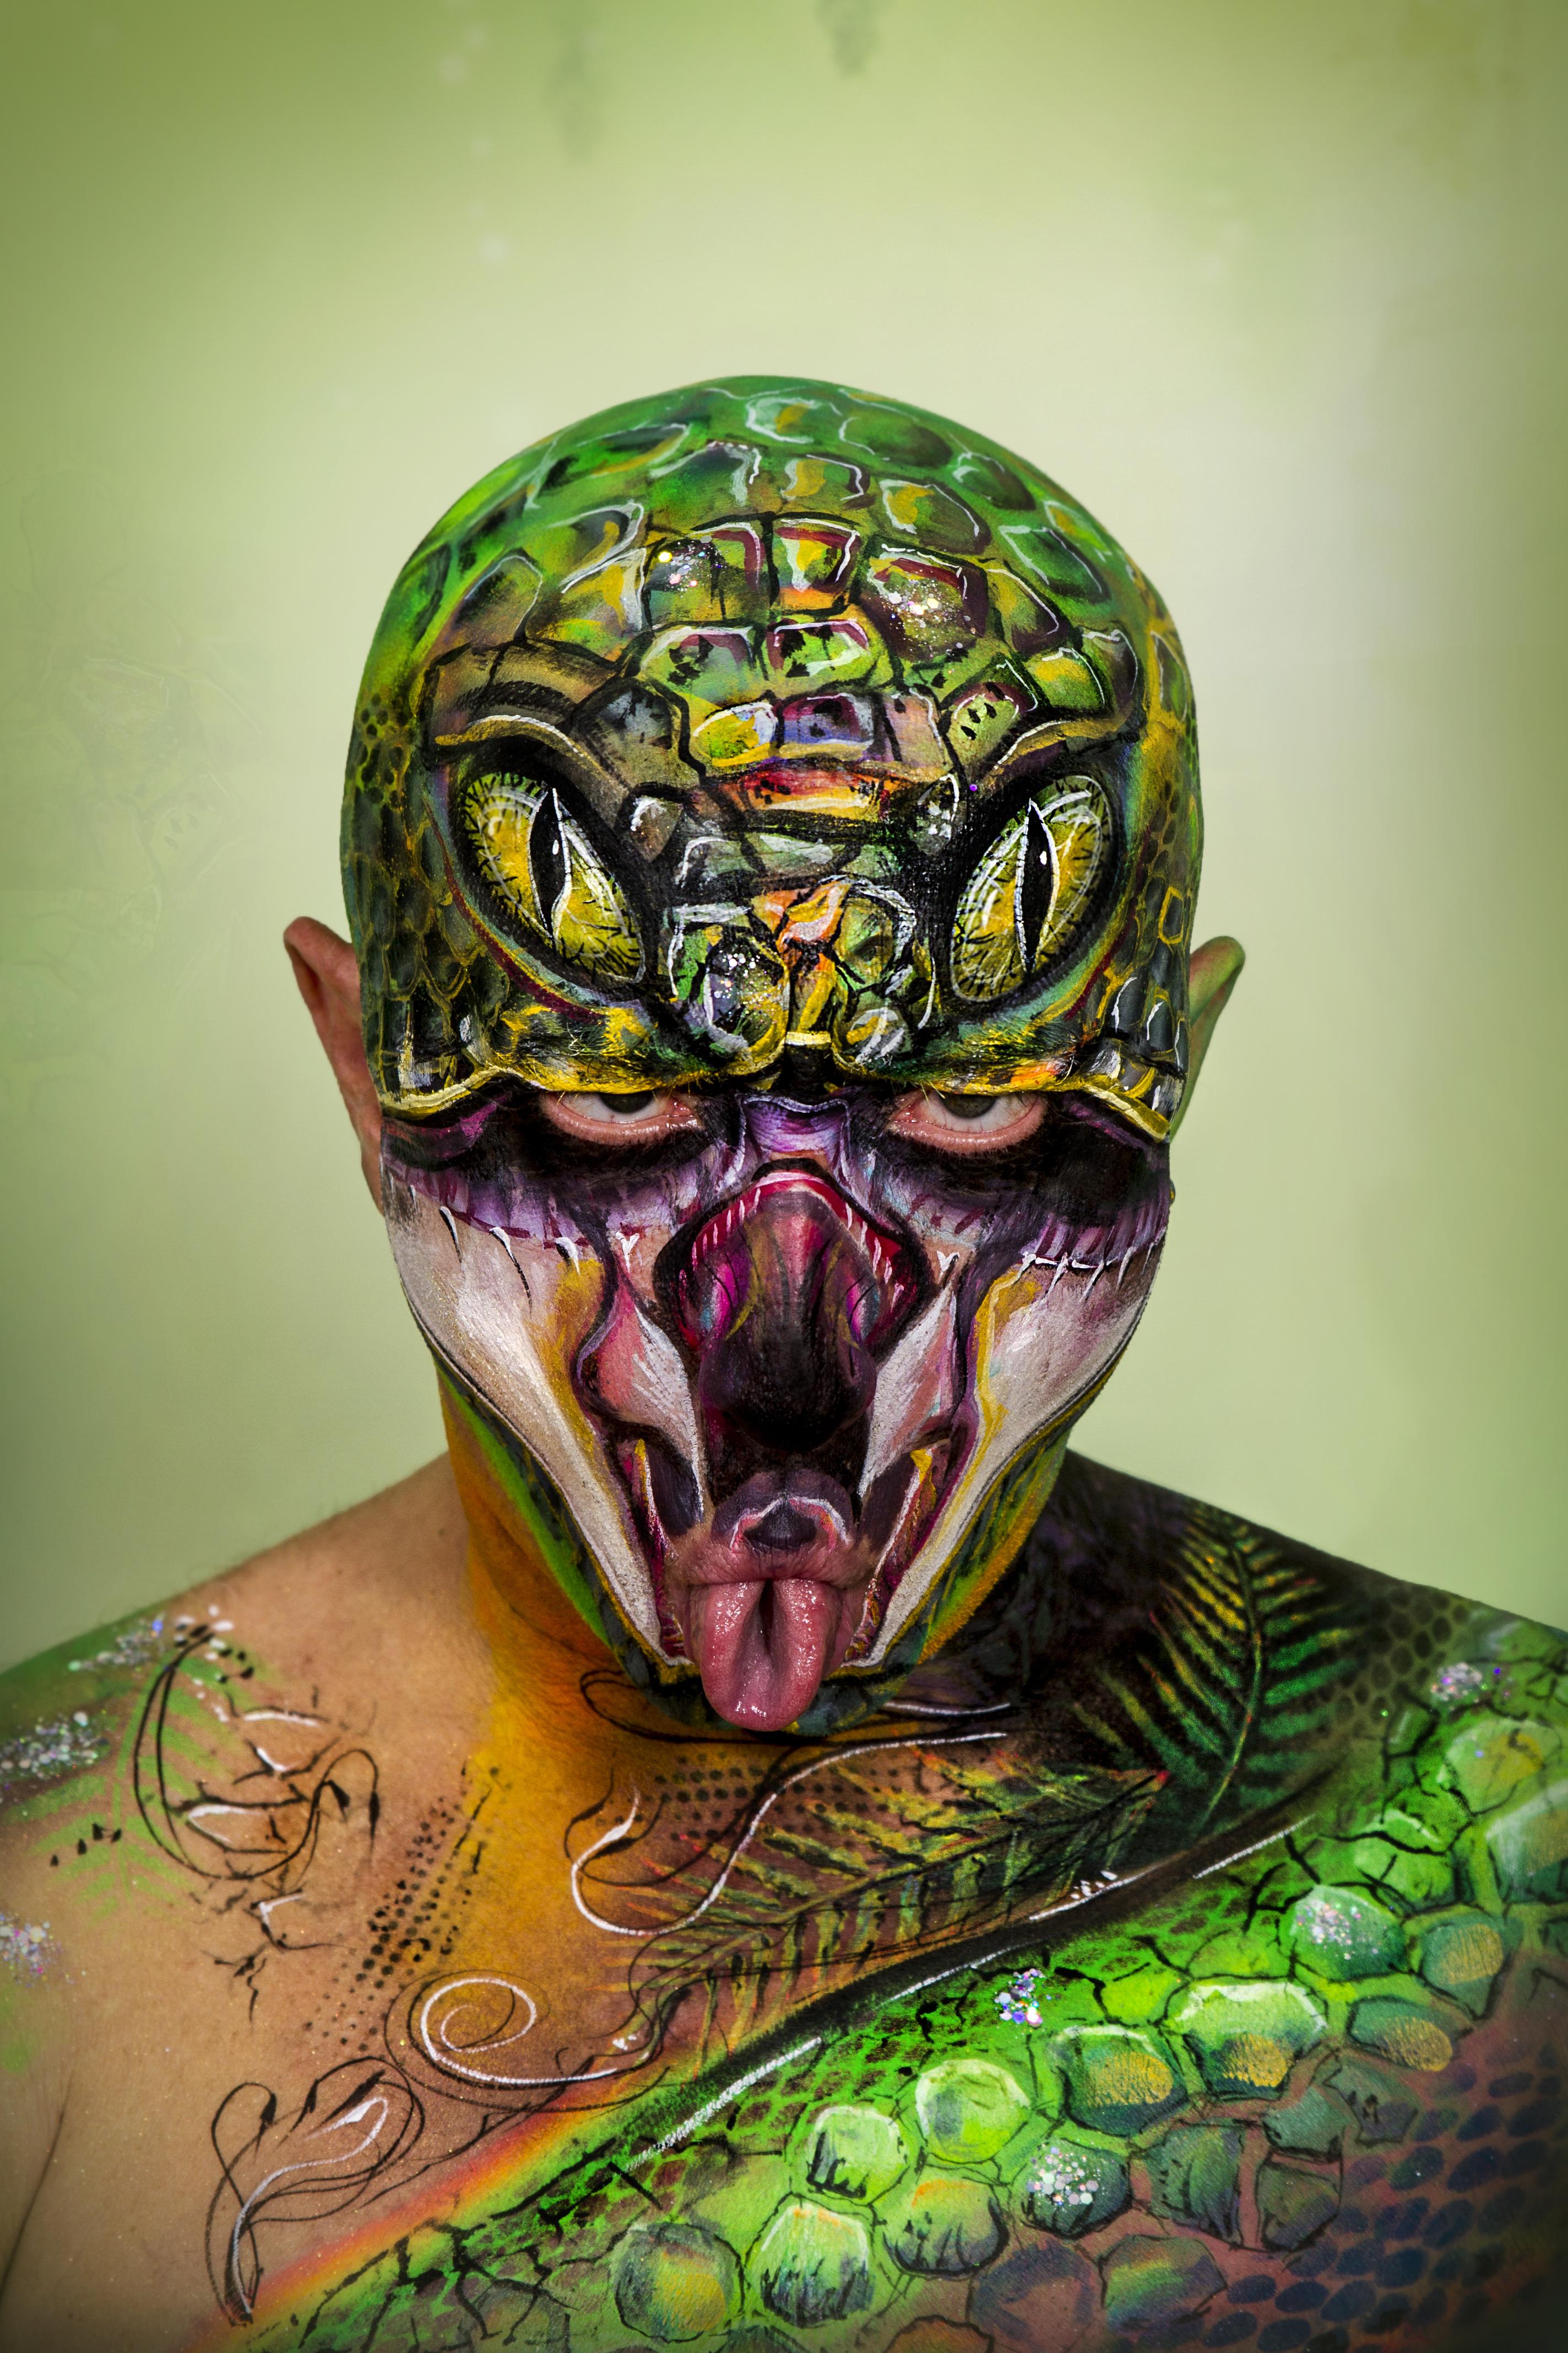 Anacondafacepaint-1